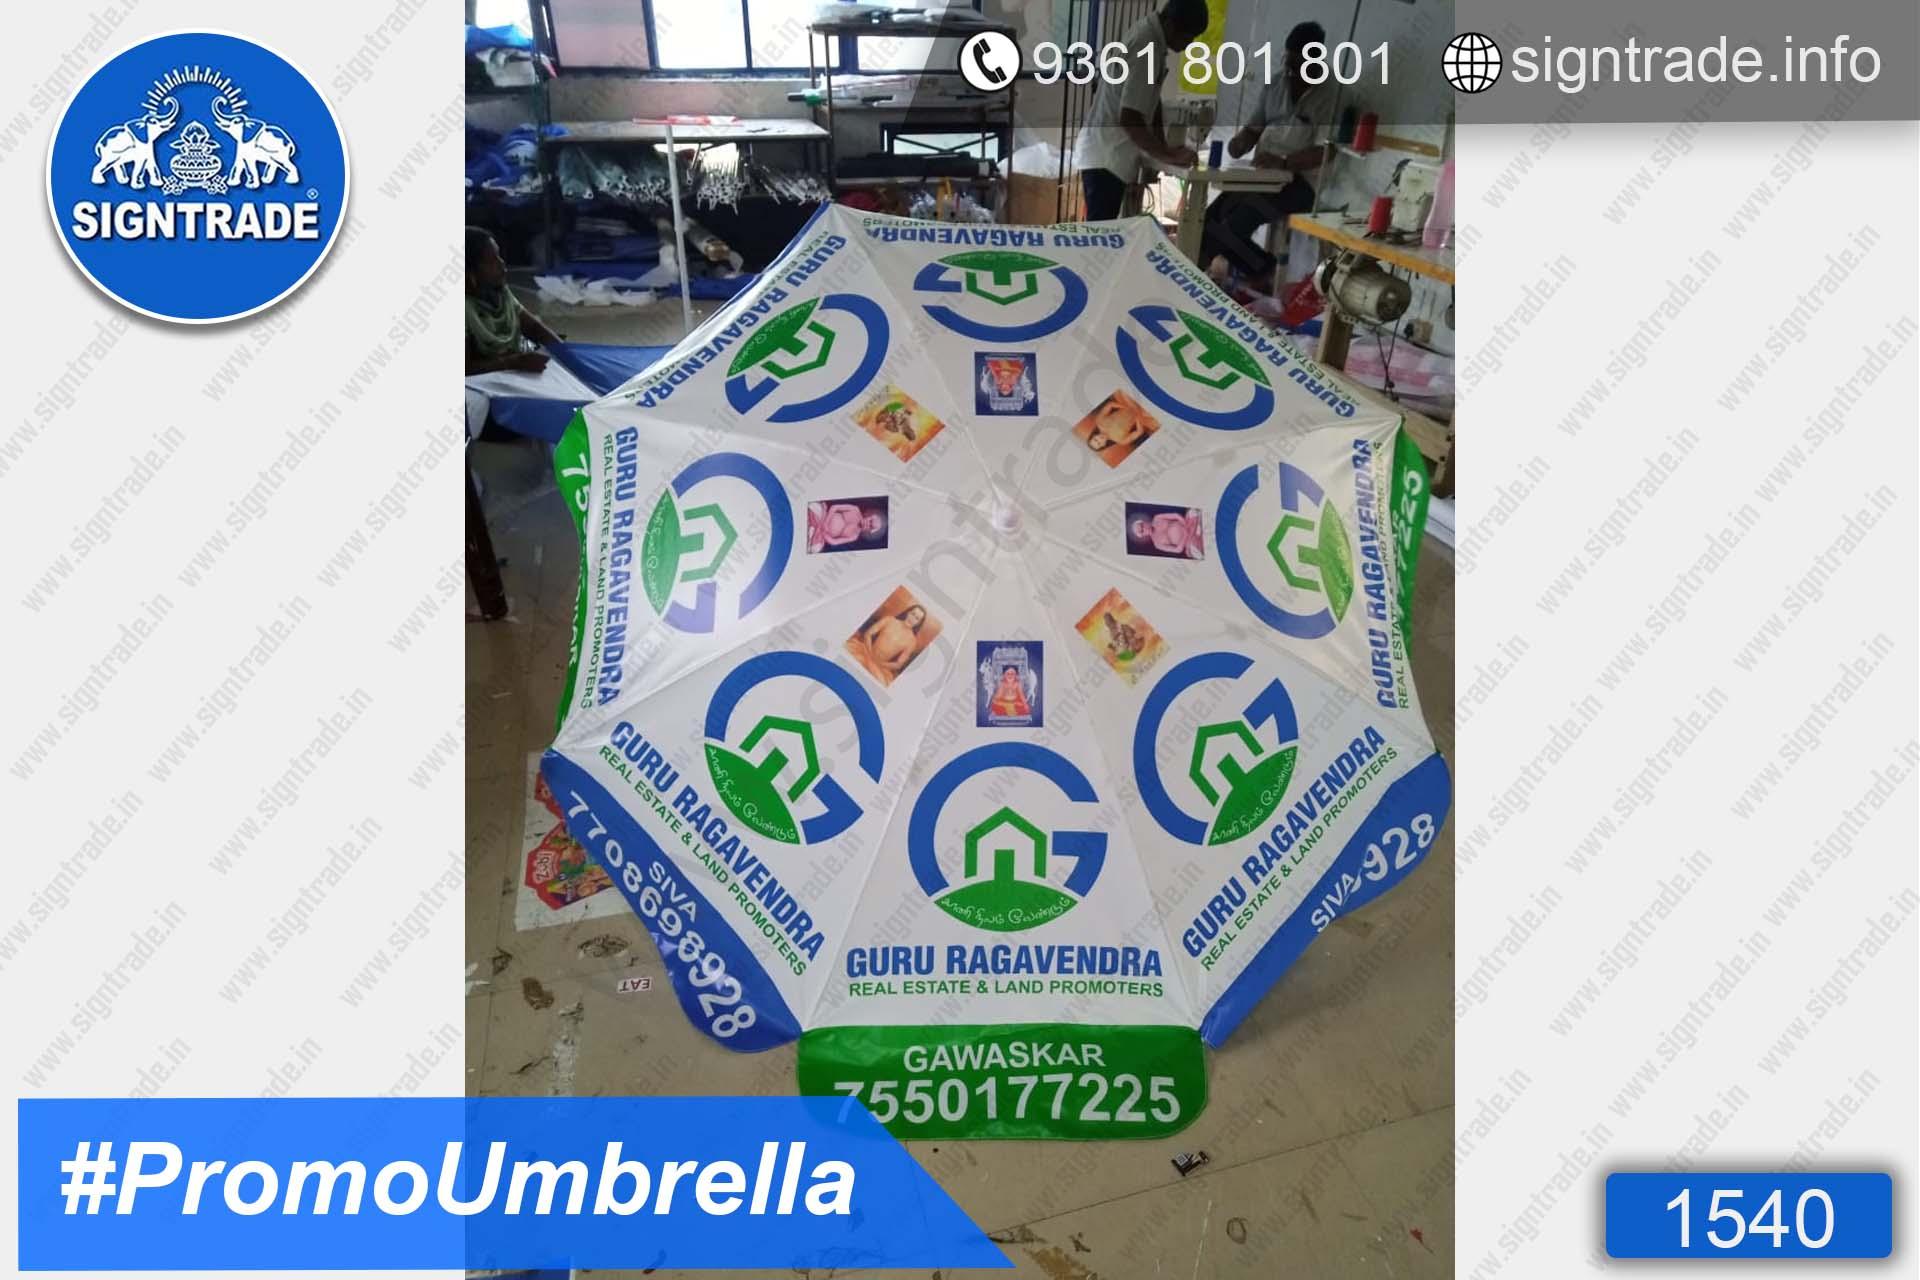 Guru Raghavendra Real Estate, Chennai - SIGNTRADE - Promotional Umbrella Manufactures in Chennai